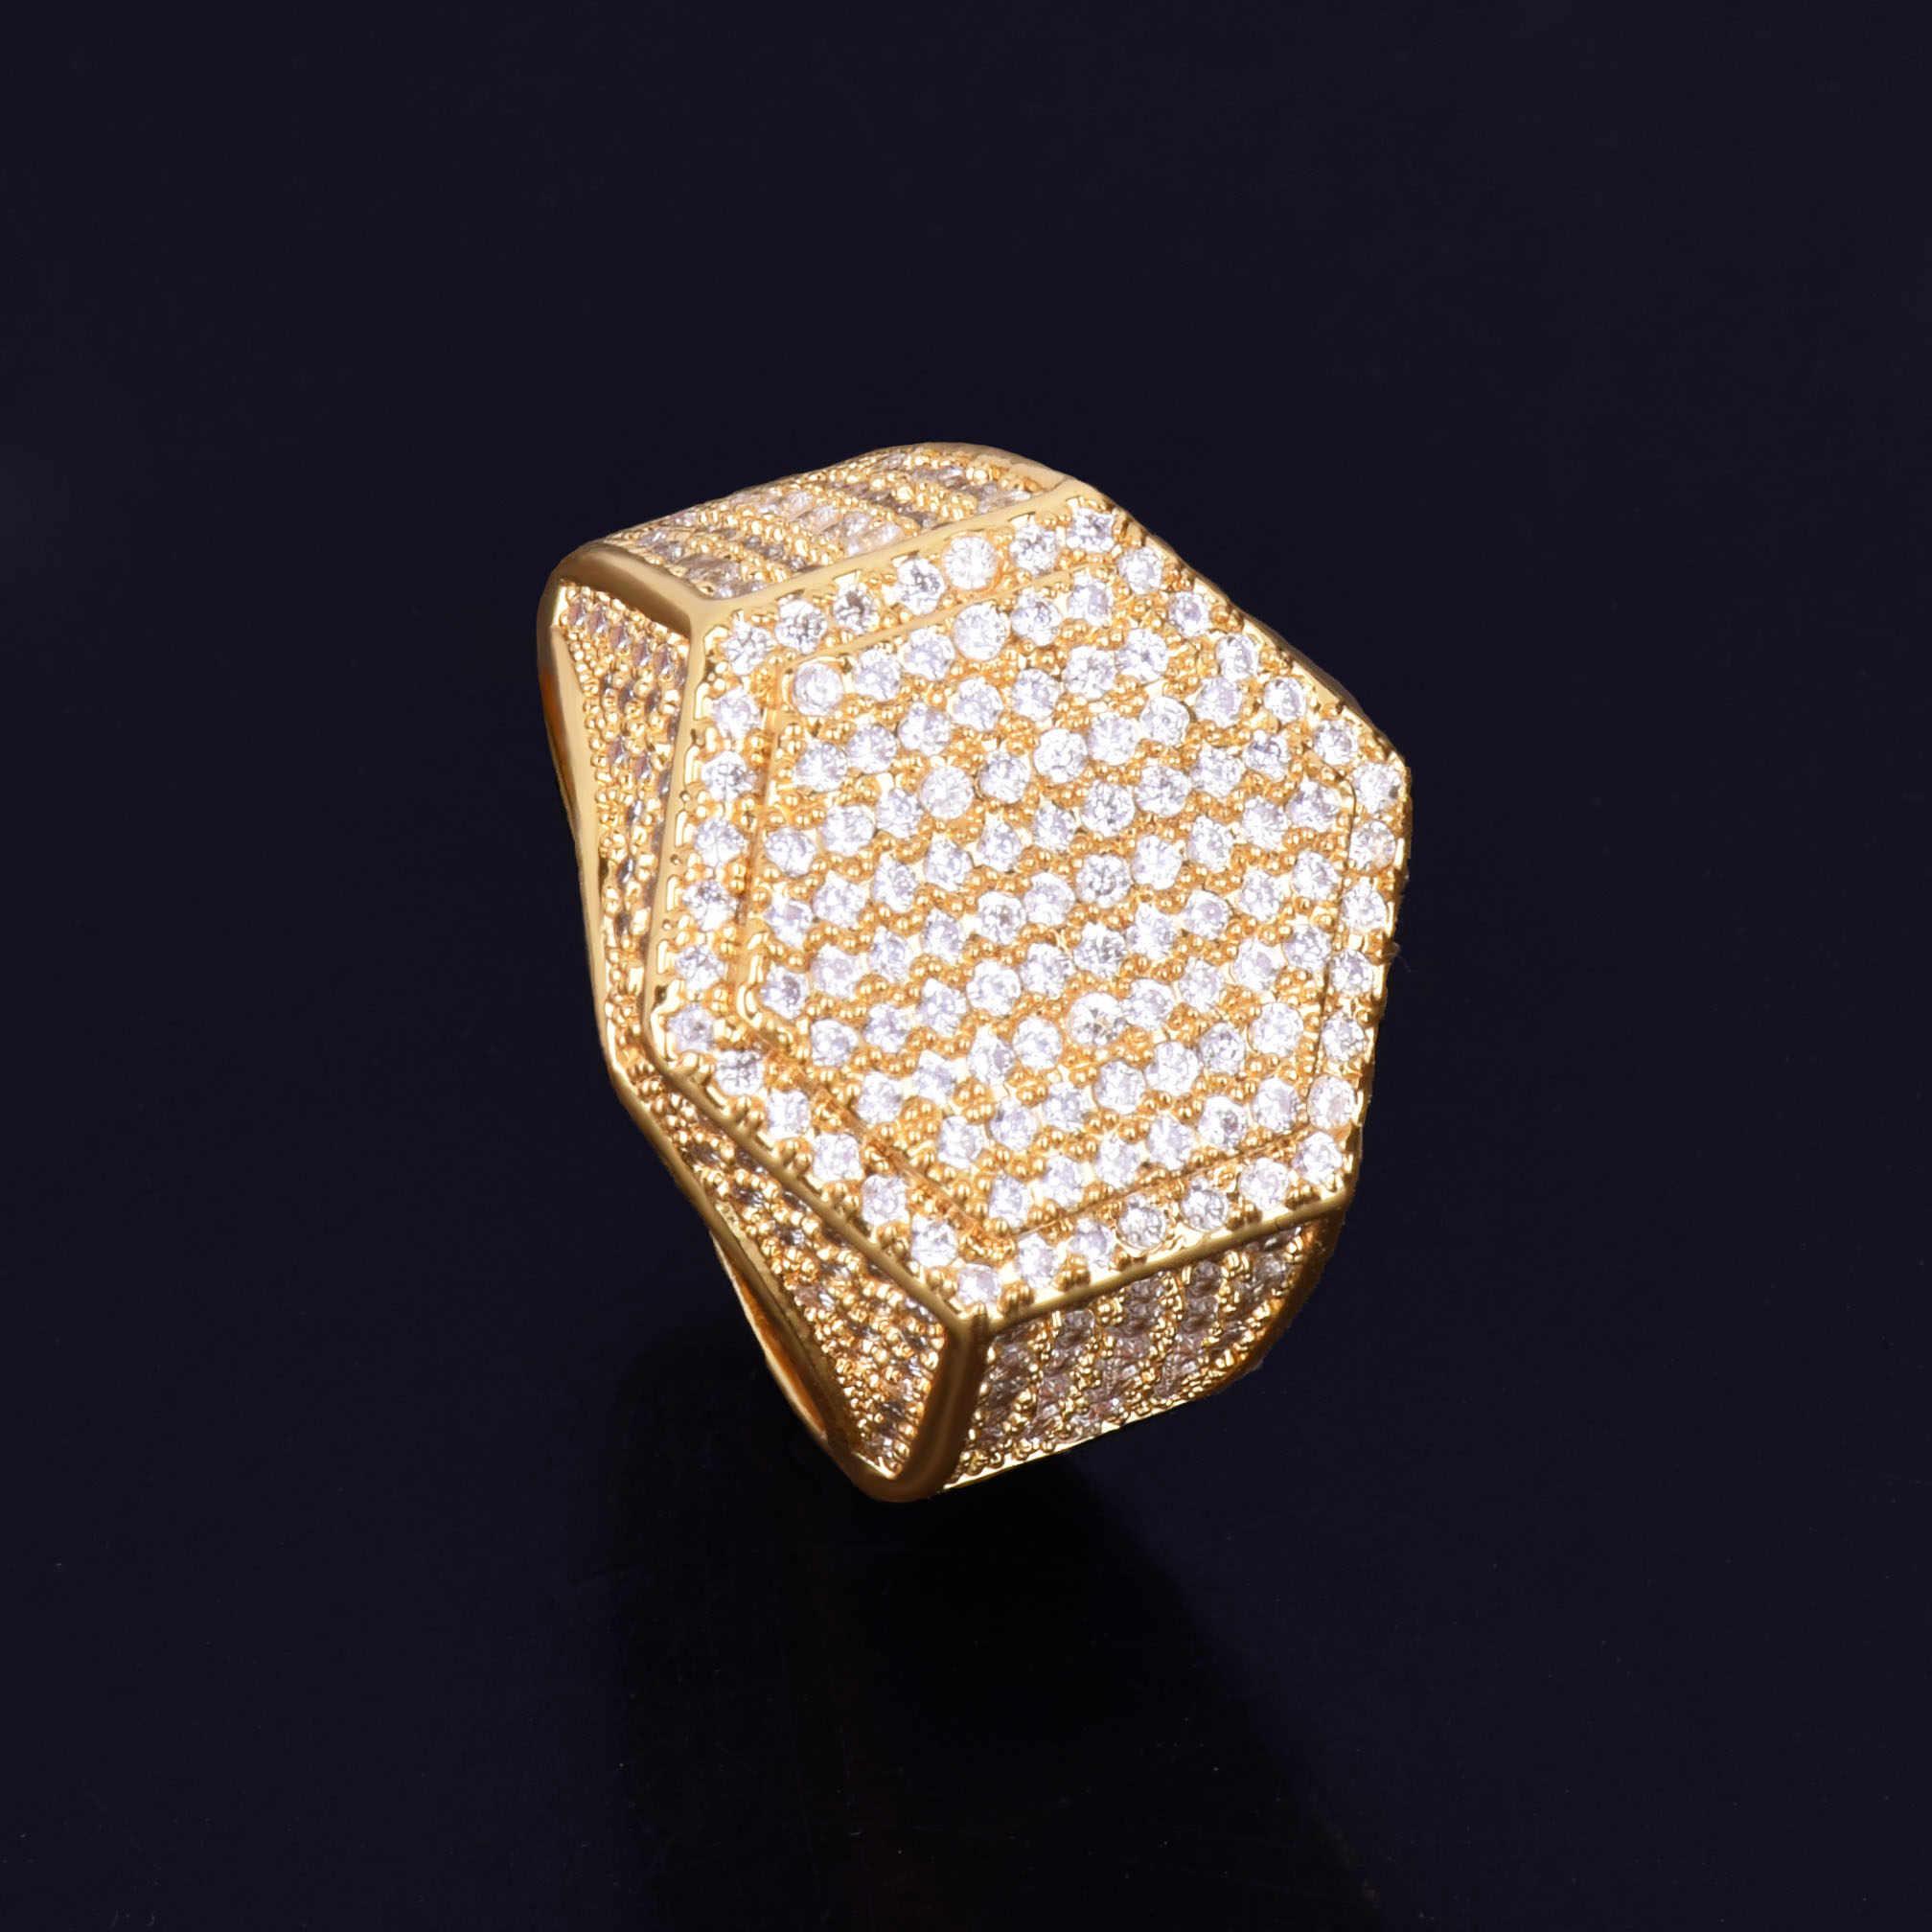 Gold แหวนผู้ชาย 18 K ทองแดง Charm AAA Cubic Zircon แฟชั่นเครื่องประดับ Hip Hop แหวนผู้ชาย